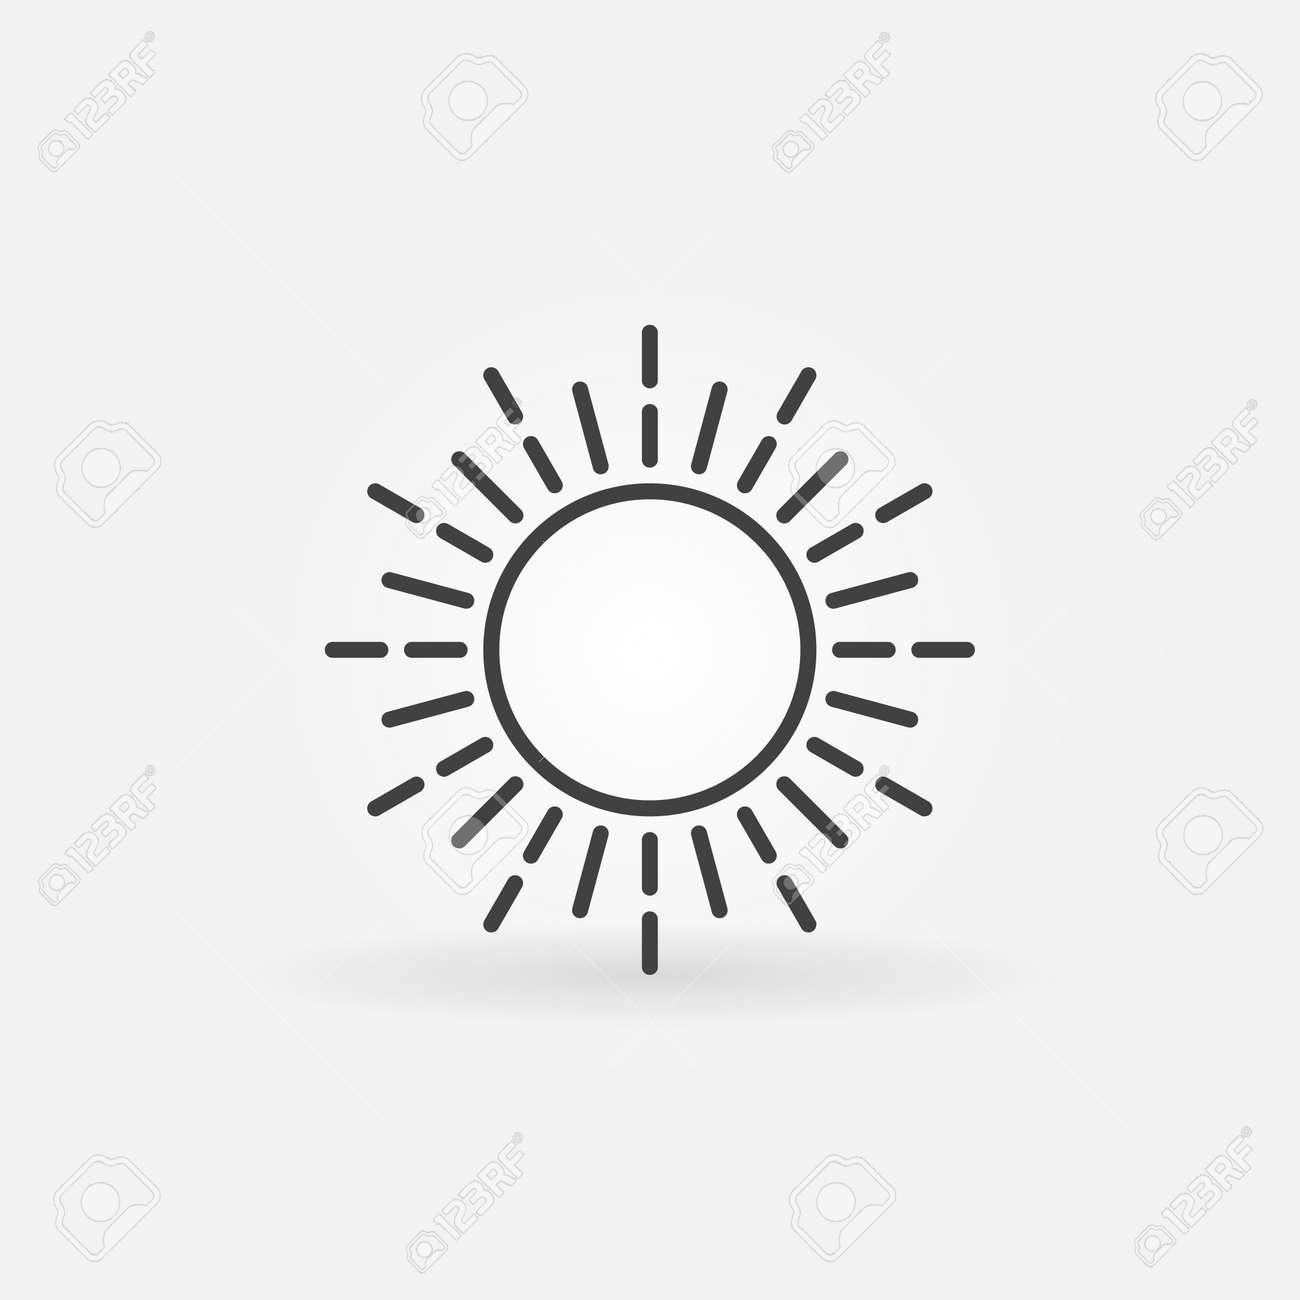 linear sun logo simple vector dark thin isolated icon or sign